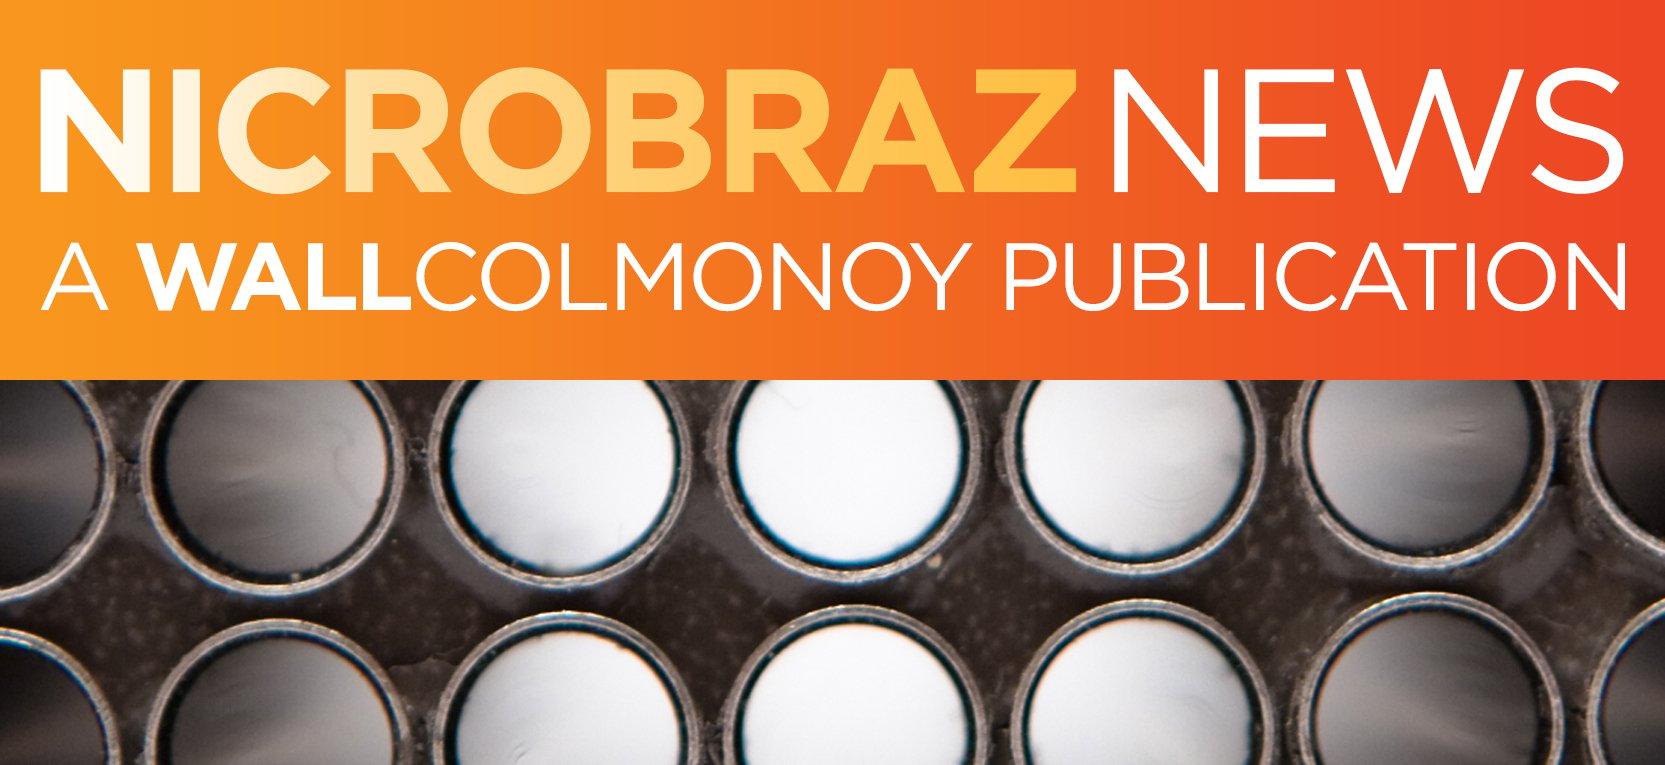 Nicrobraz News